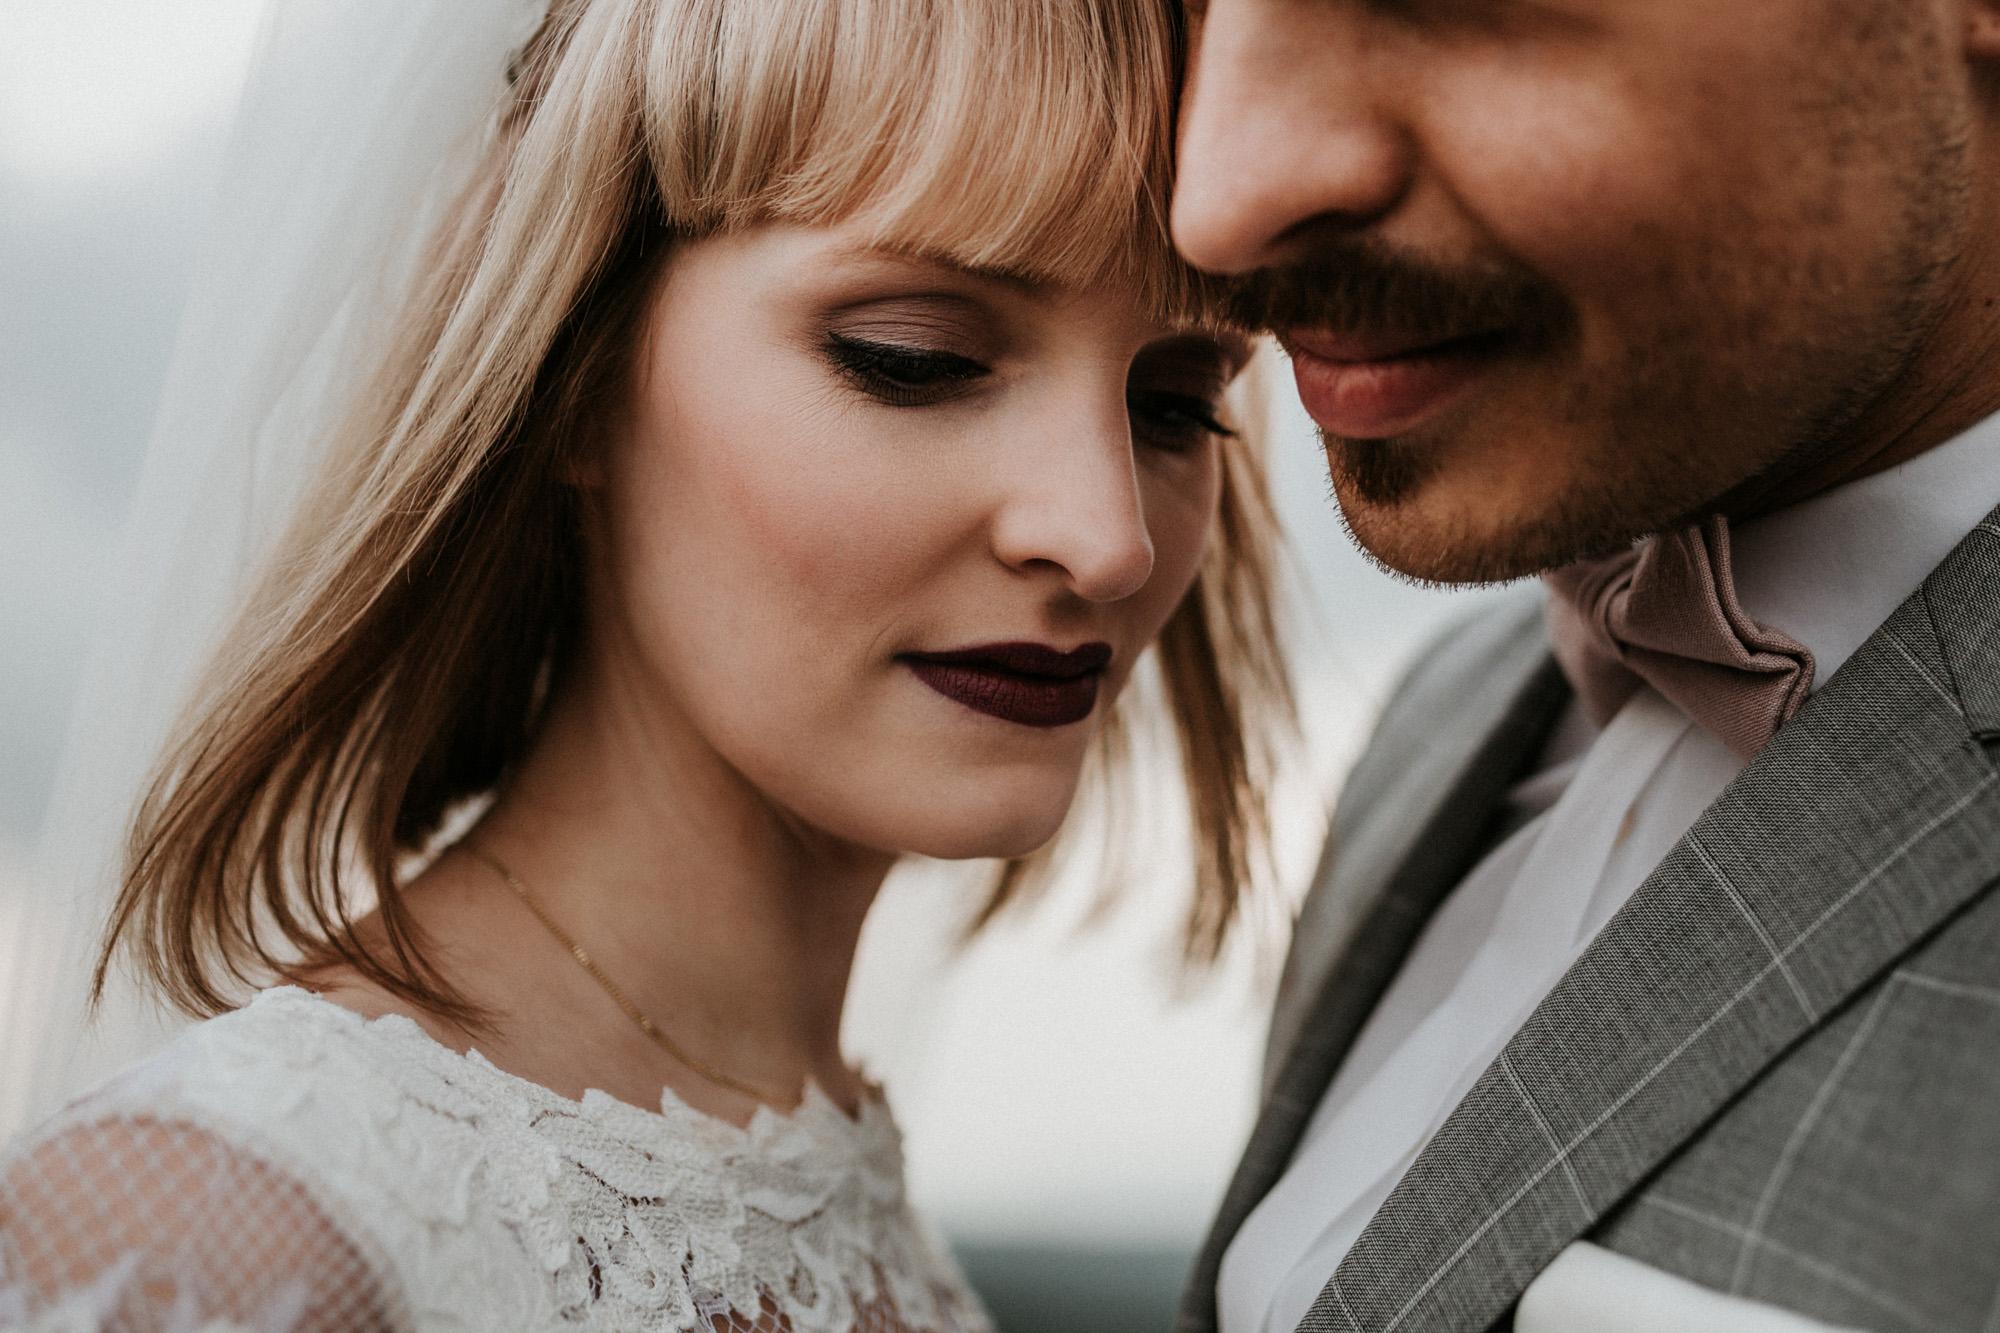 DanielaMarquardtPhotography_Hochzeitsfotograf_Düsseldorf_Köln_Mallorca_Bayern_Austria_Harz_LinaundMaik_Afterwedding-Shooting_Weddingphotographer_Ibiza_Tuskany_Italien_Toskana17